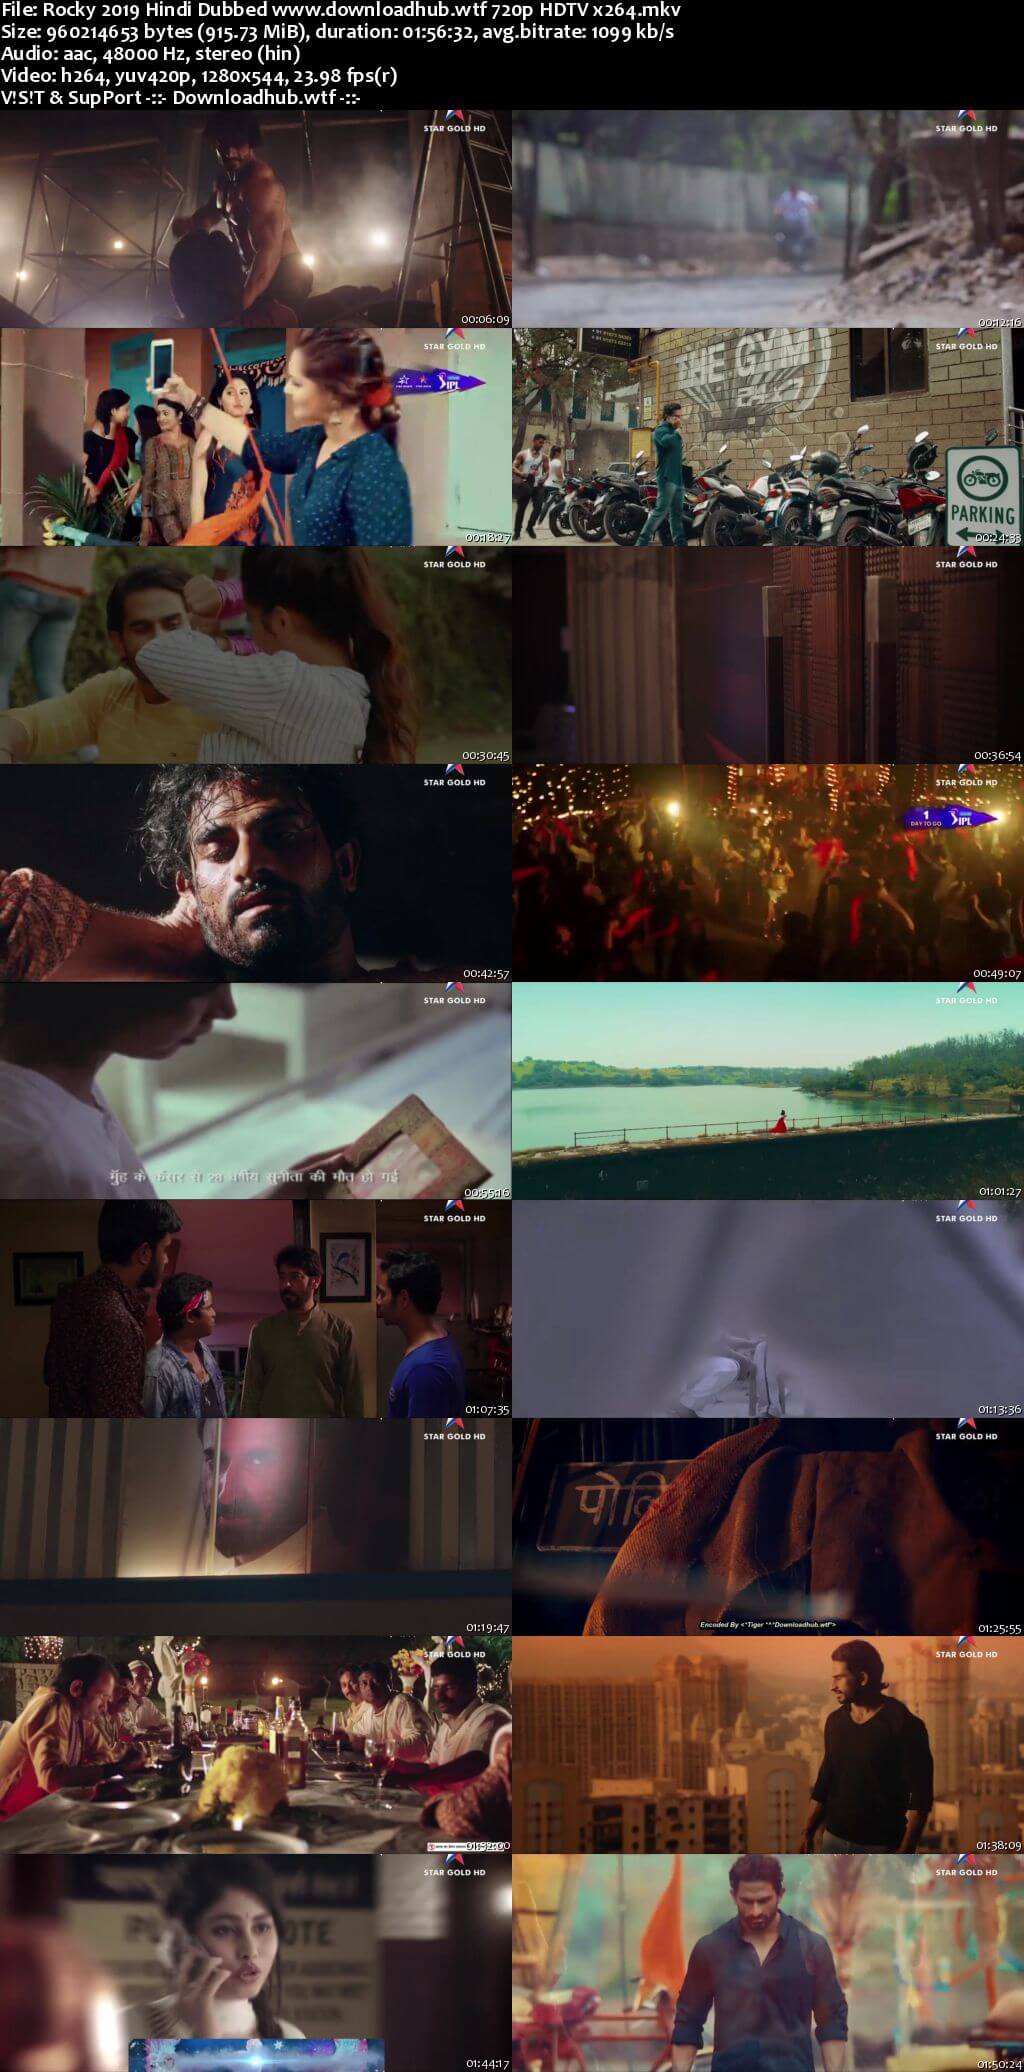 Rocky 2019 Hindi Dubbed 720p HDTV x264